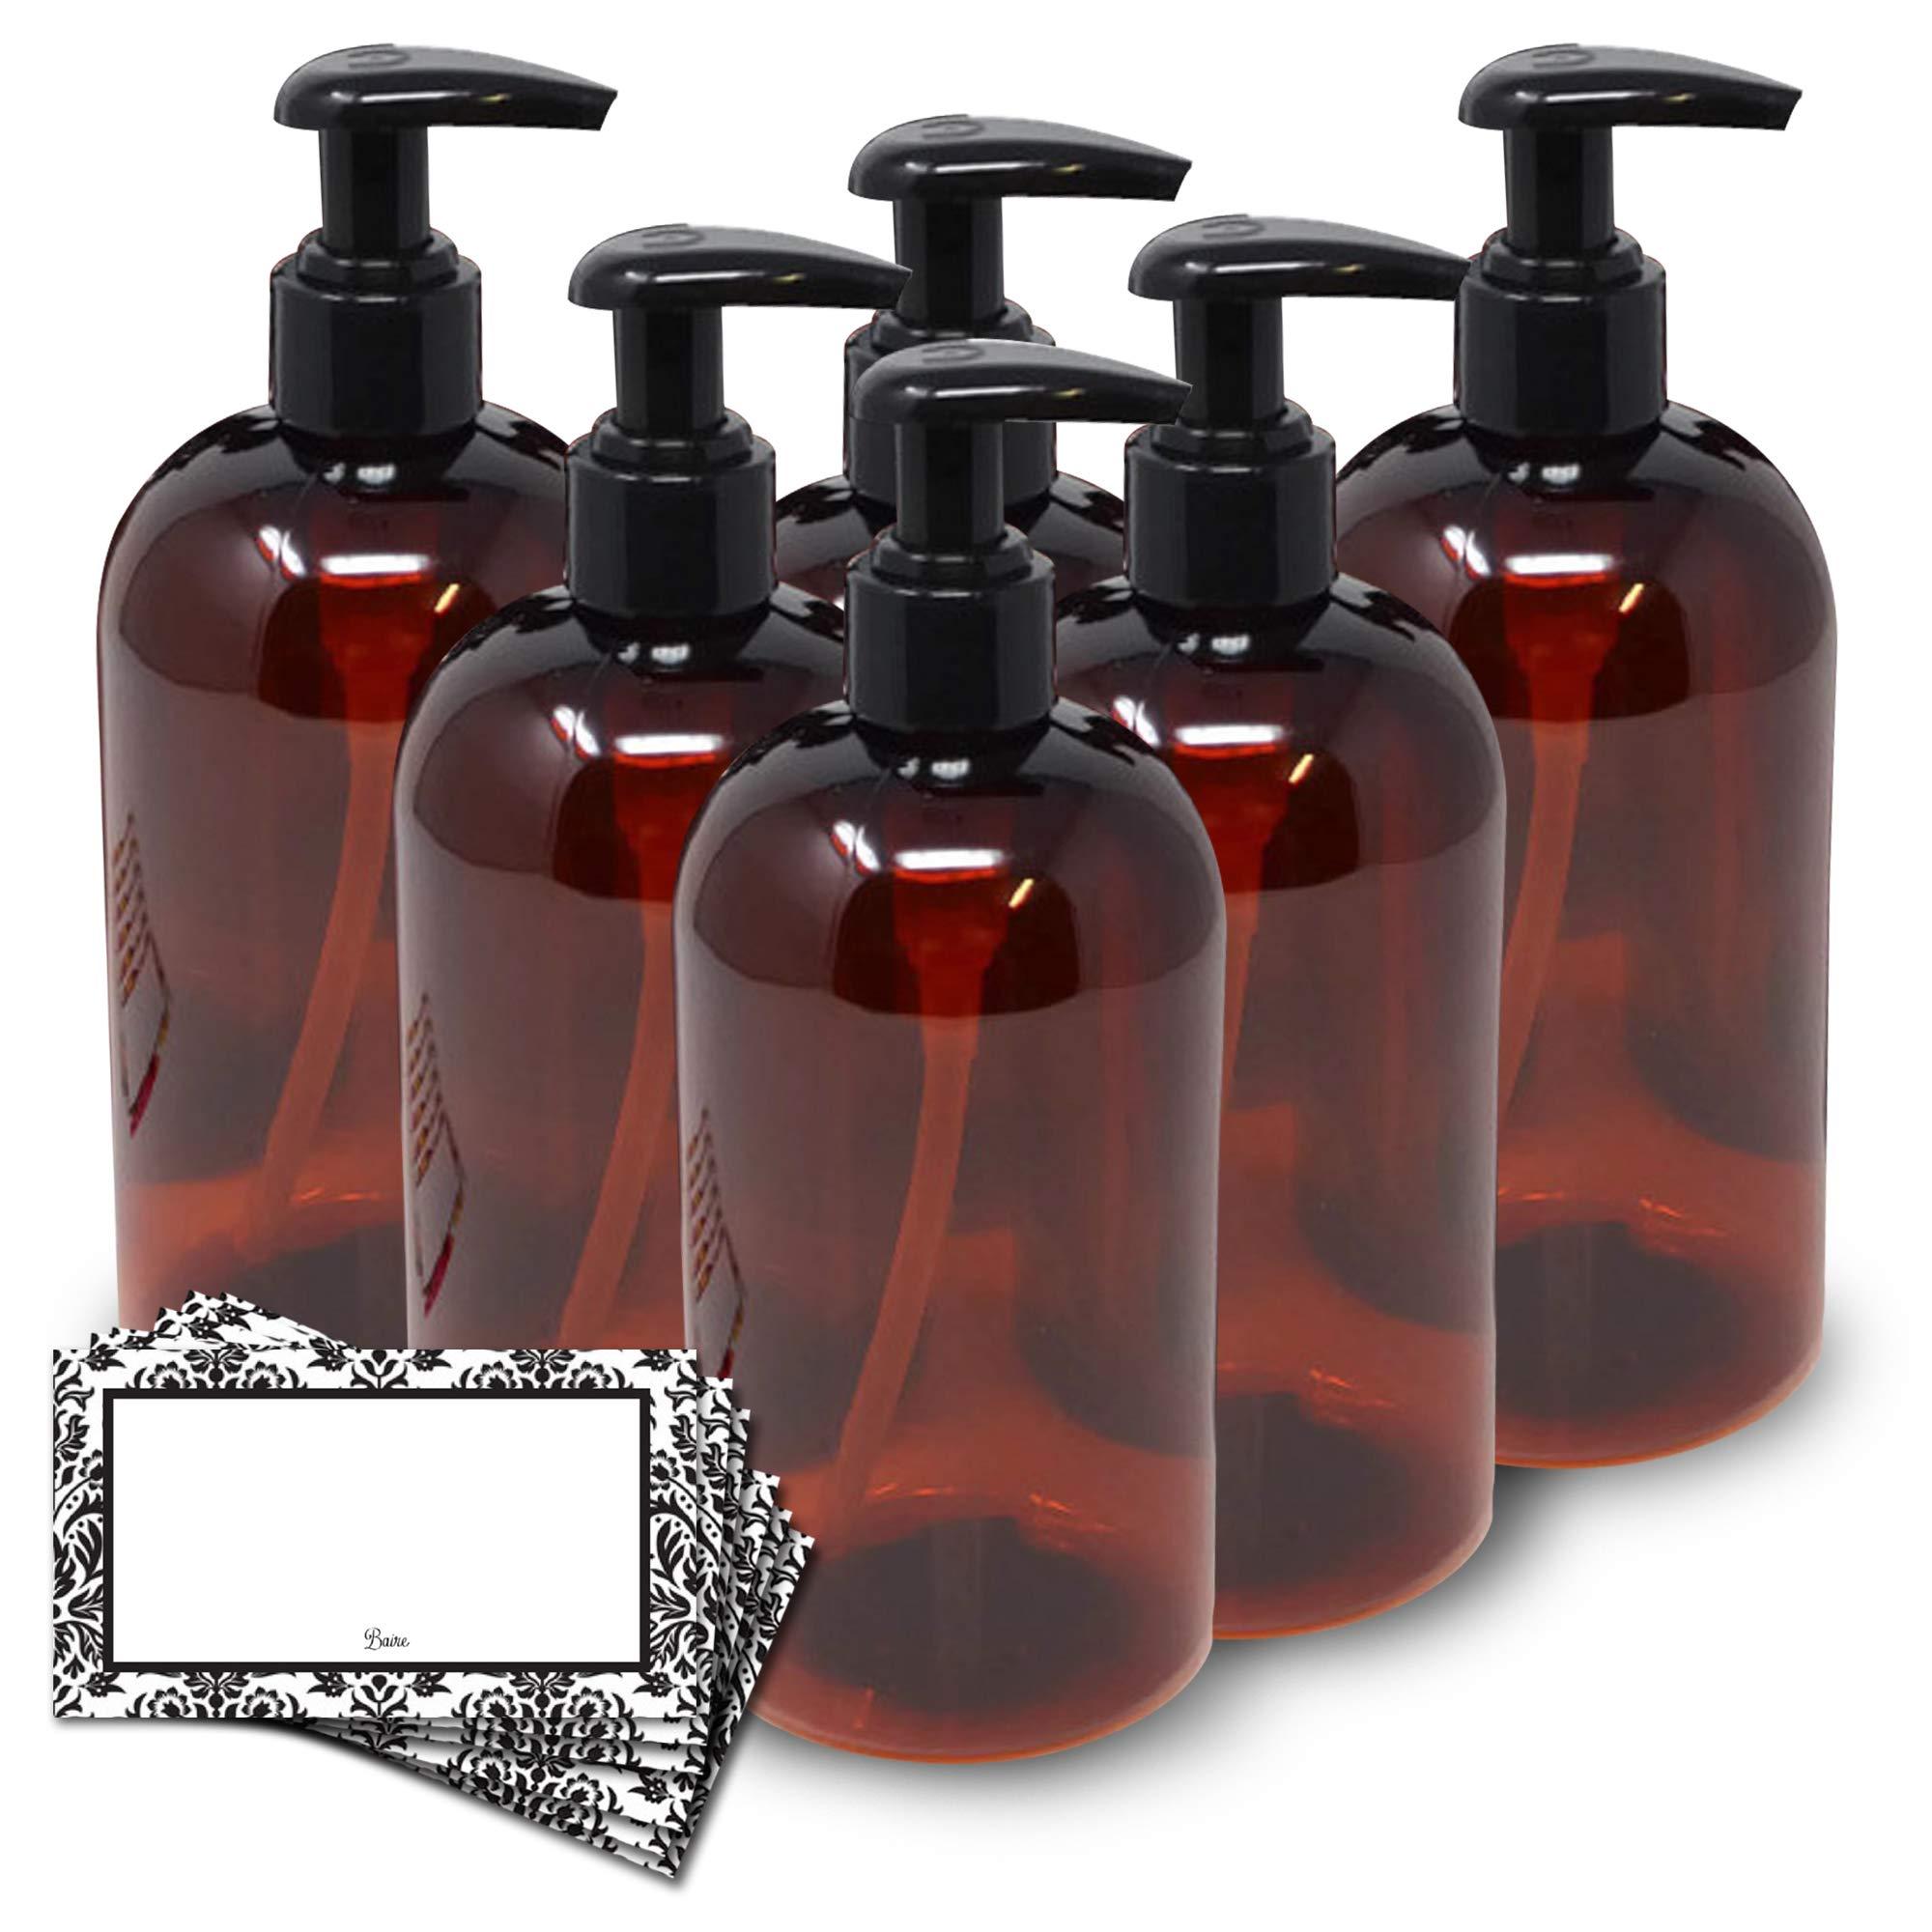 BAIRE BOTTLES - 16 OZ BROWN AMBER PLASTIC REFILLABLE BOTTLE with BLACK LOTION PUMPS - 6 Pack, BONUS 6 DAMASK LABELS - PET, Lightweight, BPA Free - ORGANIZE your Sink and Bath Area by Baire Bottles